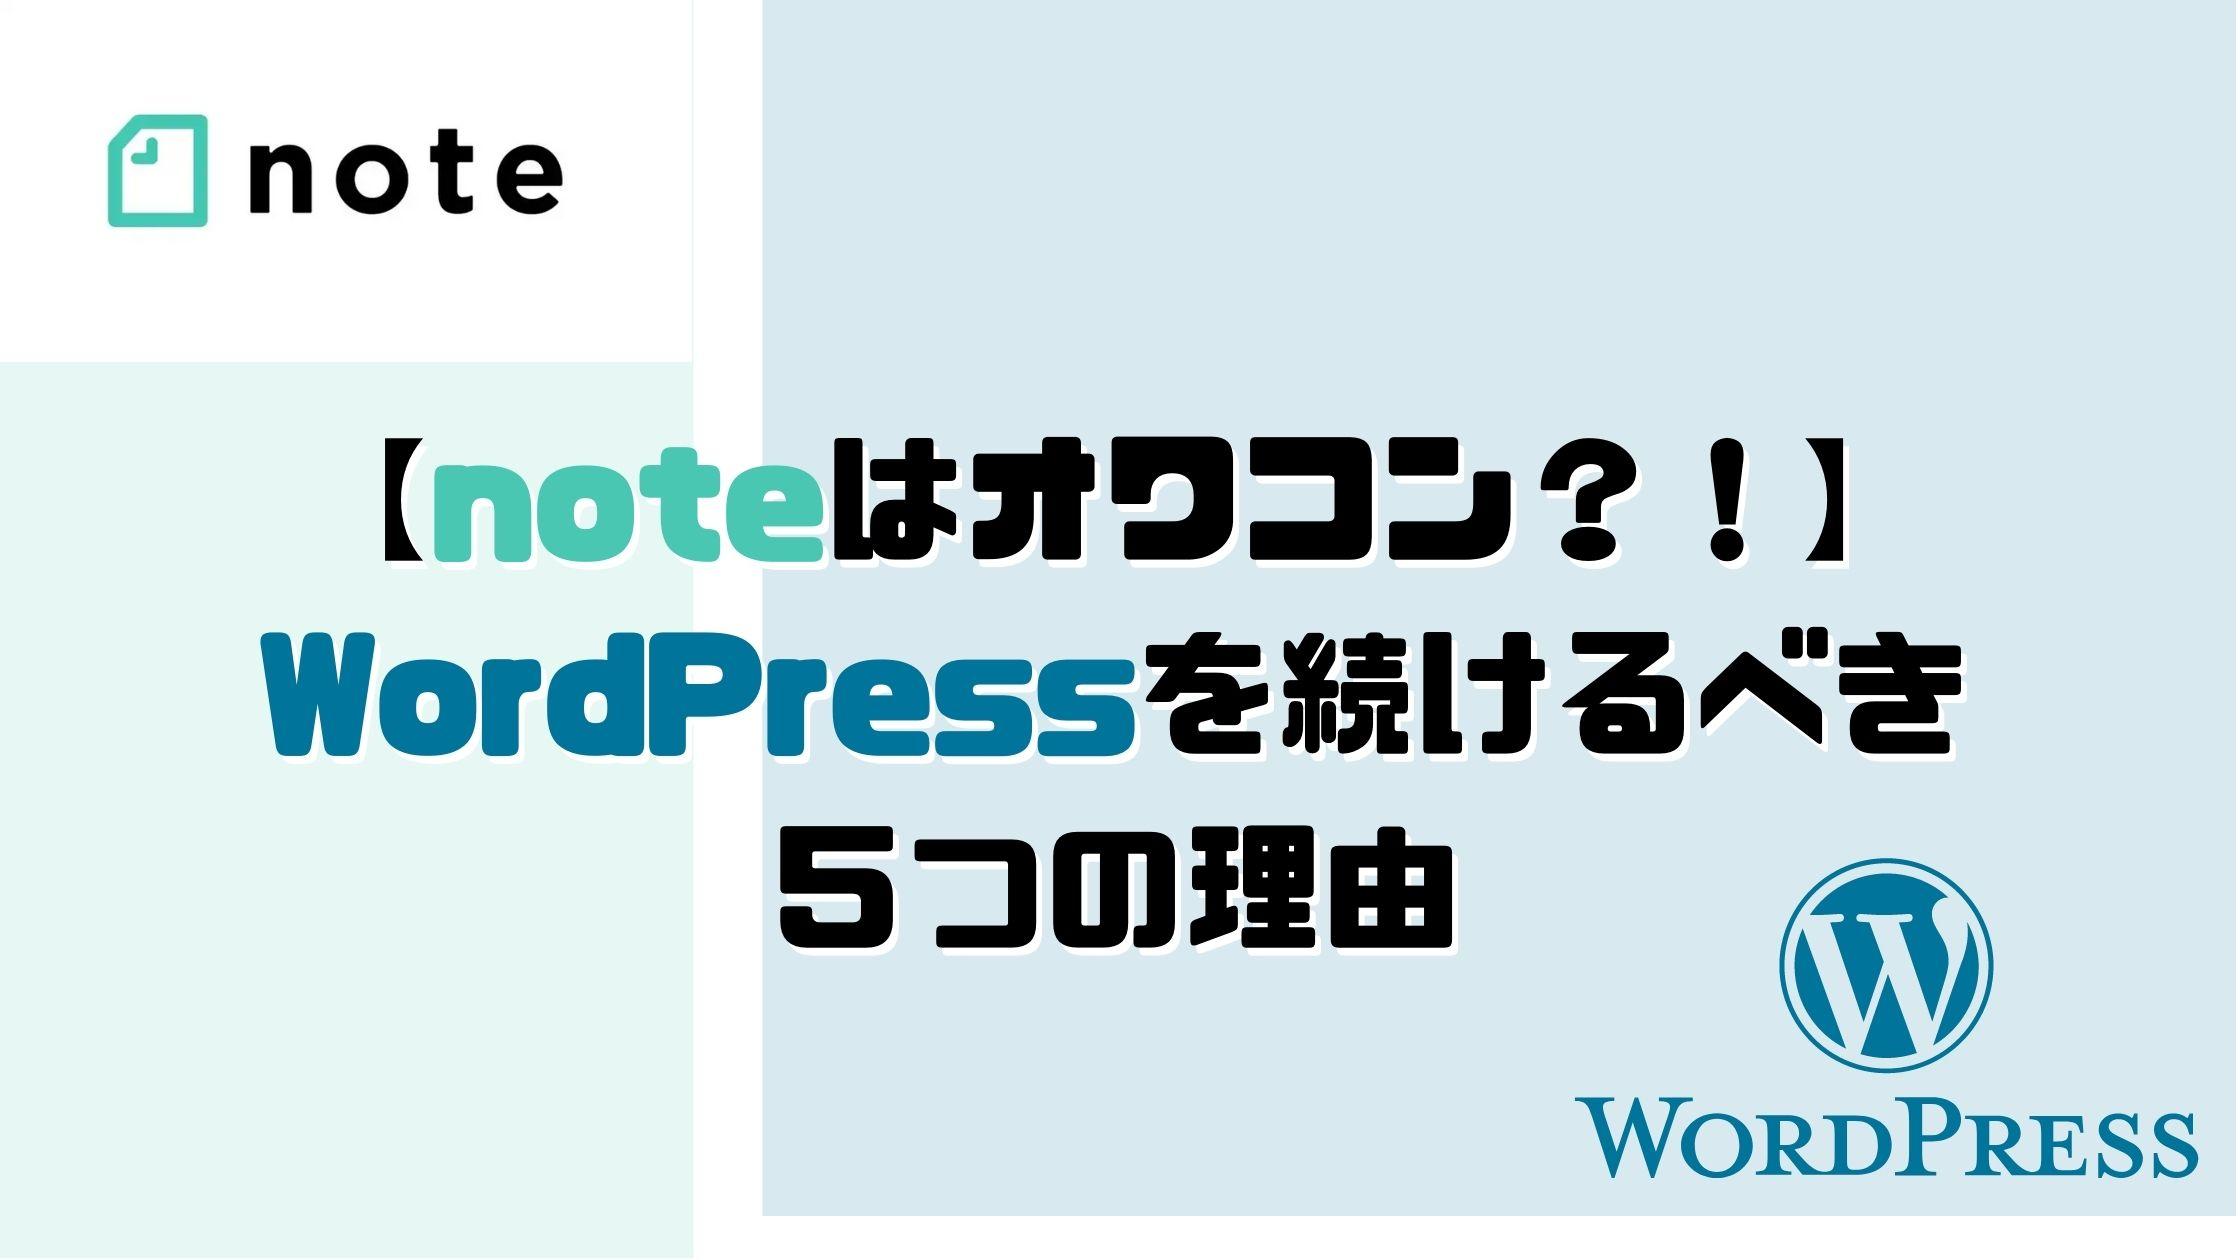 【noteはオワコン?!】WordPressを続けるべき理由